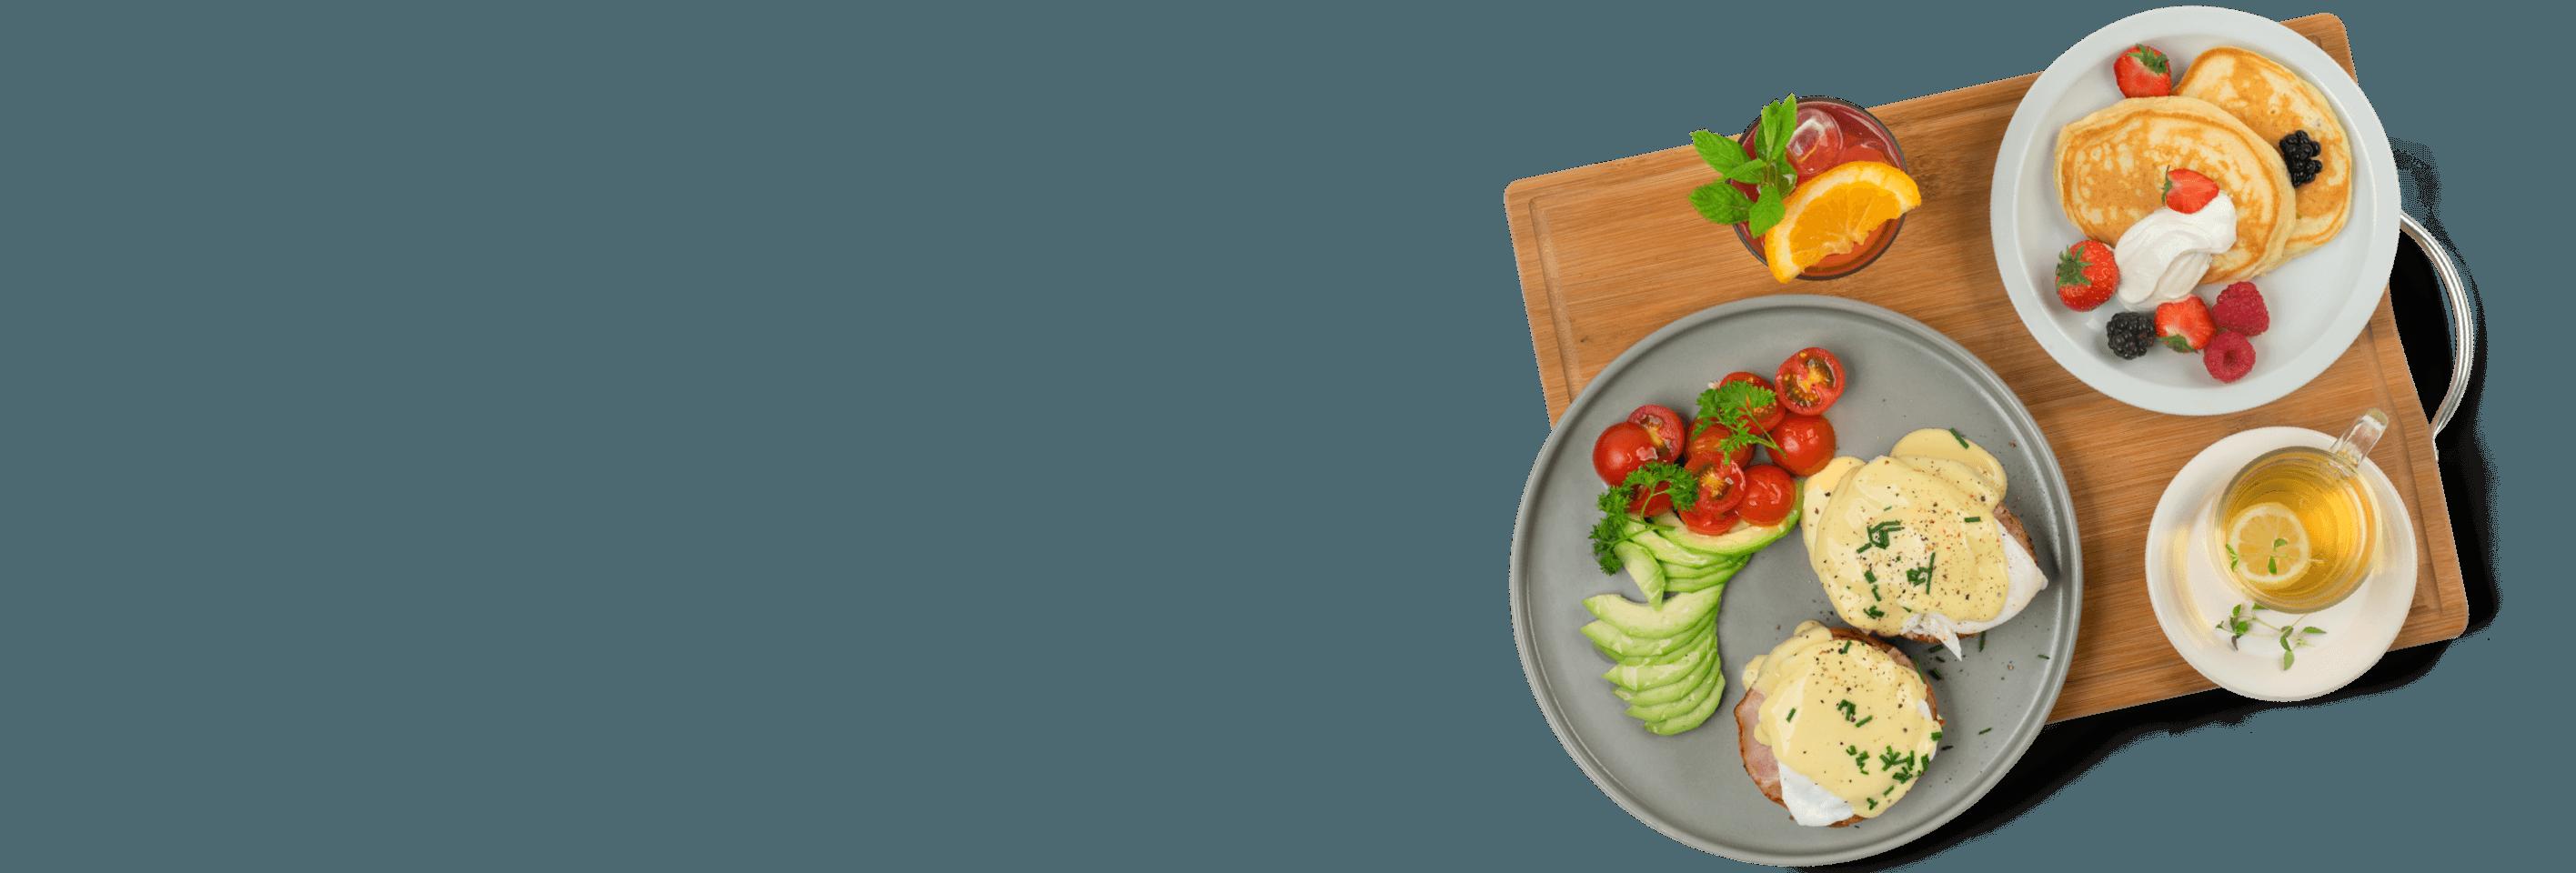 Homelette street food